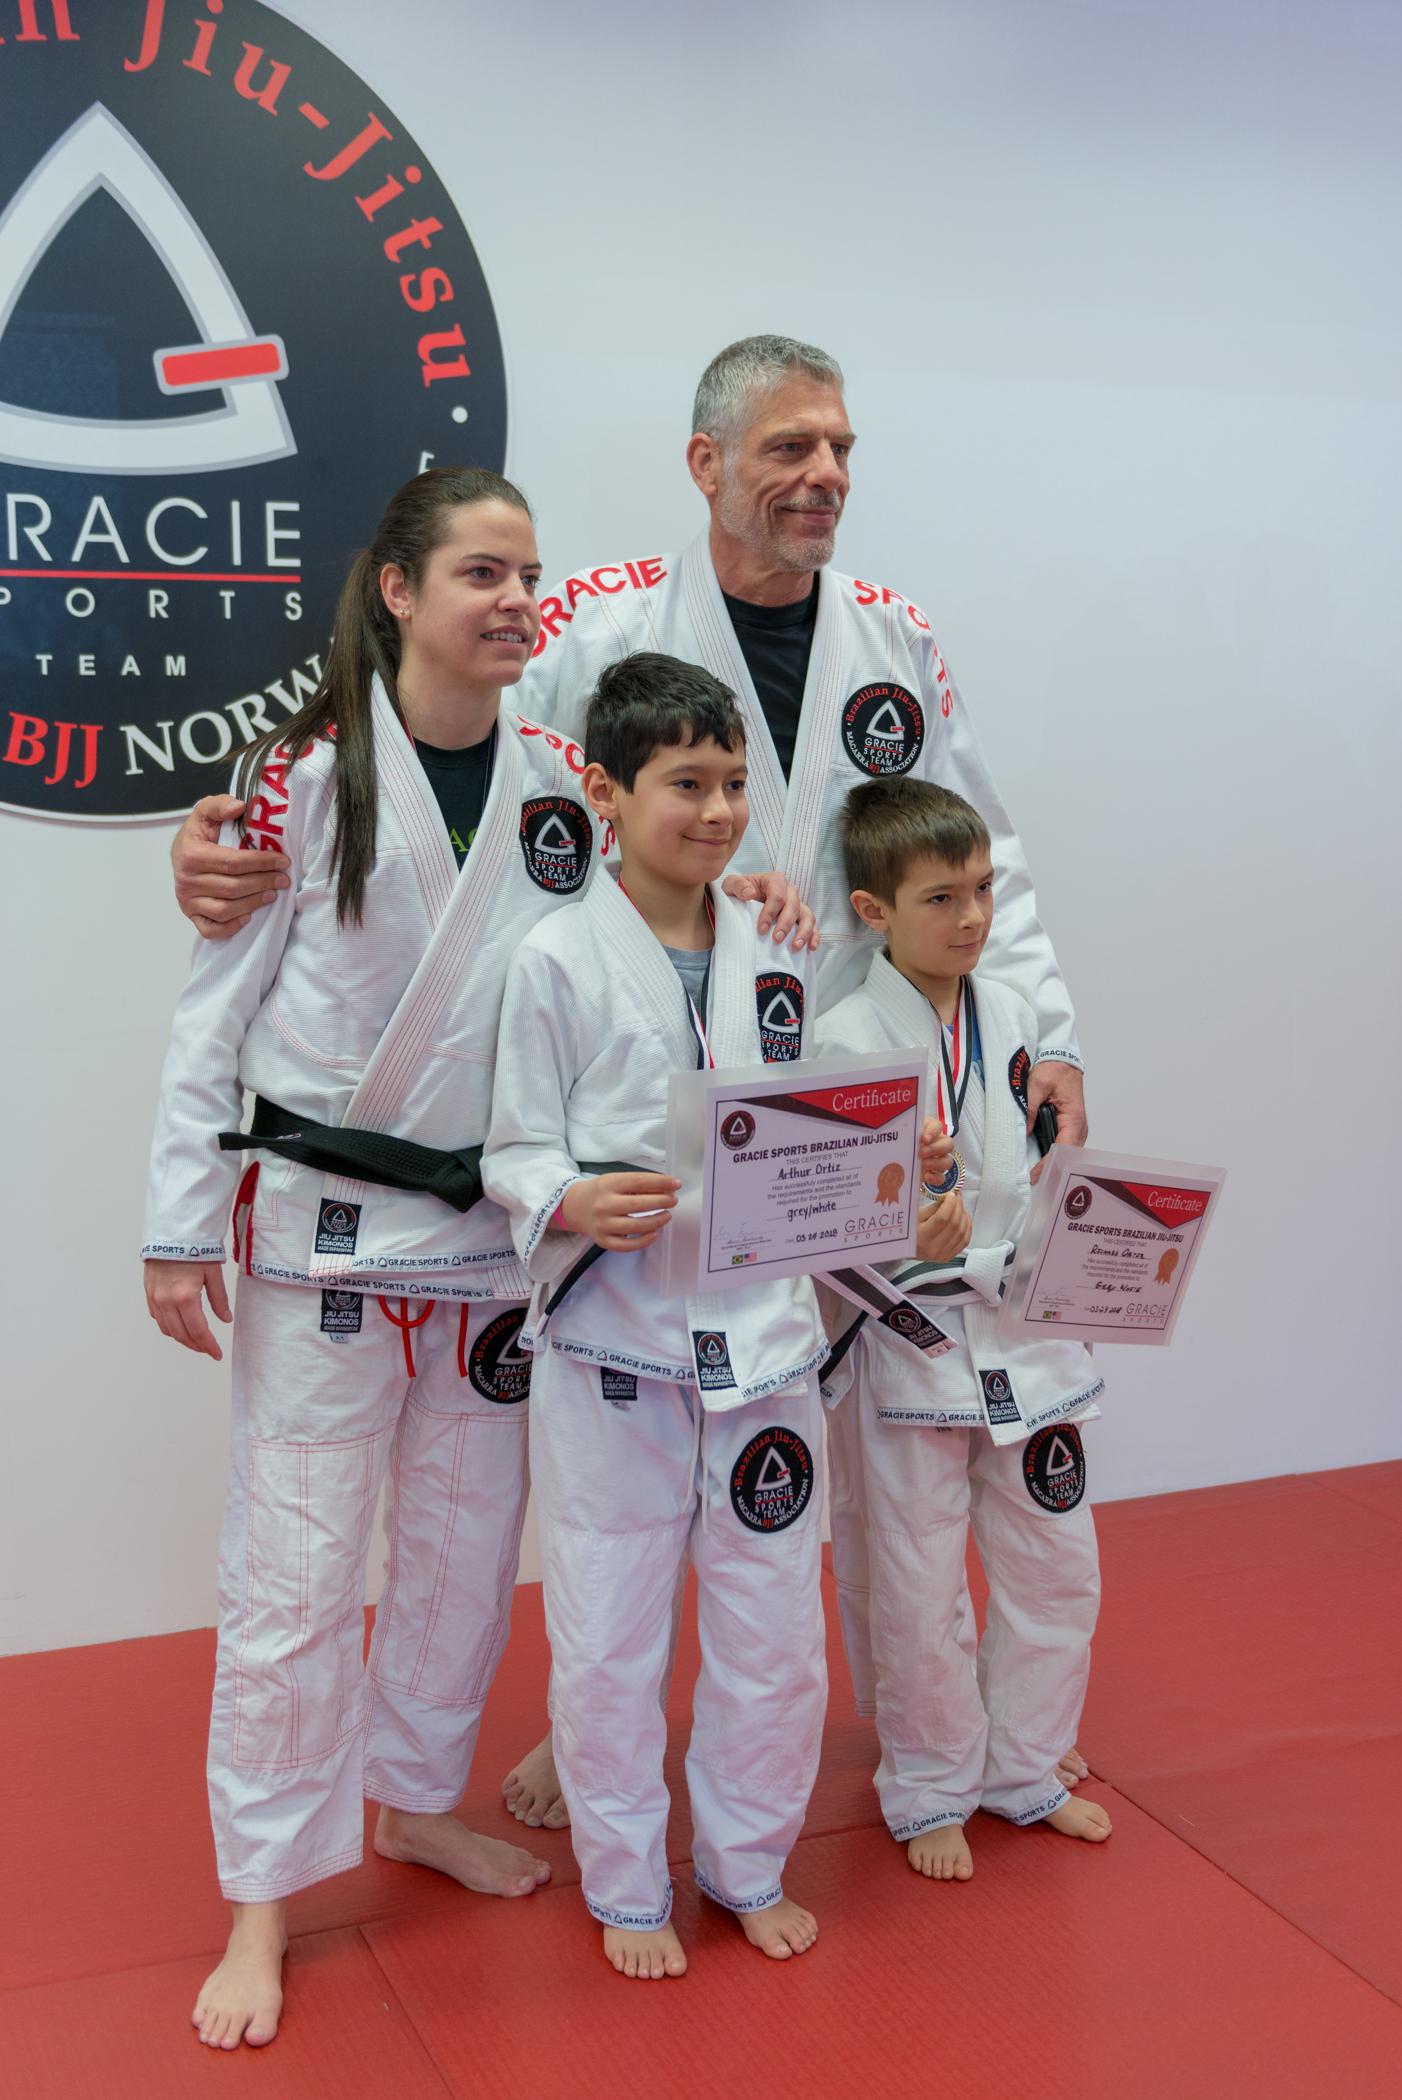 Gracie-Sports-Kids-160.jpg